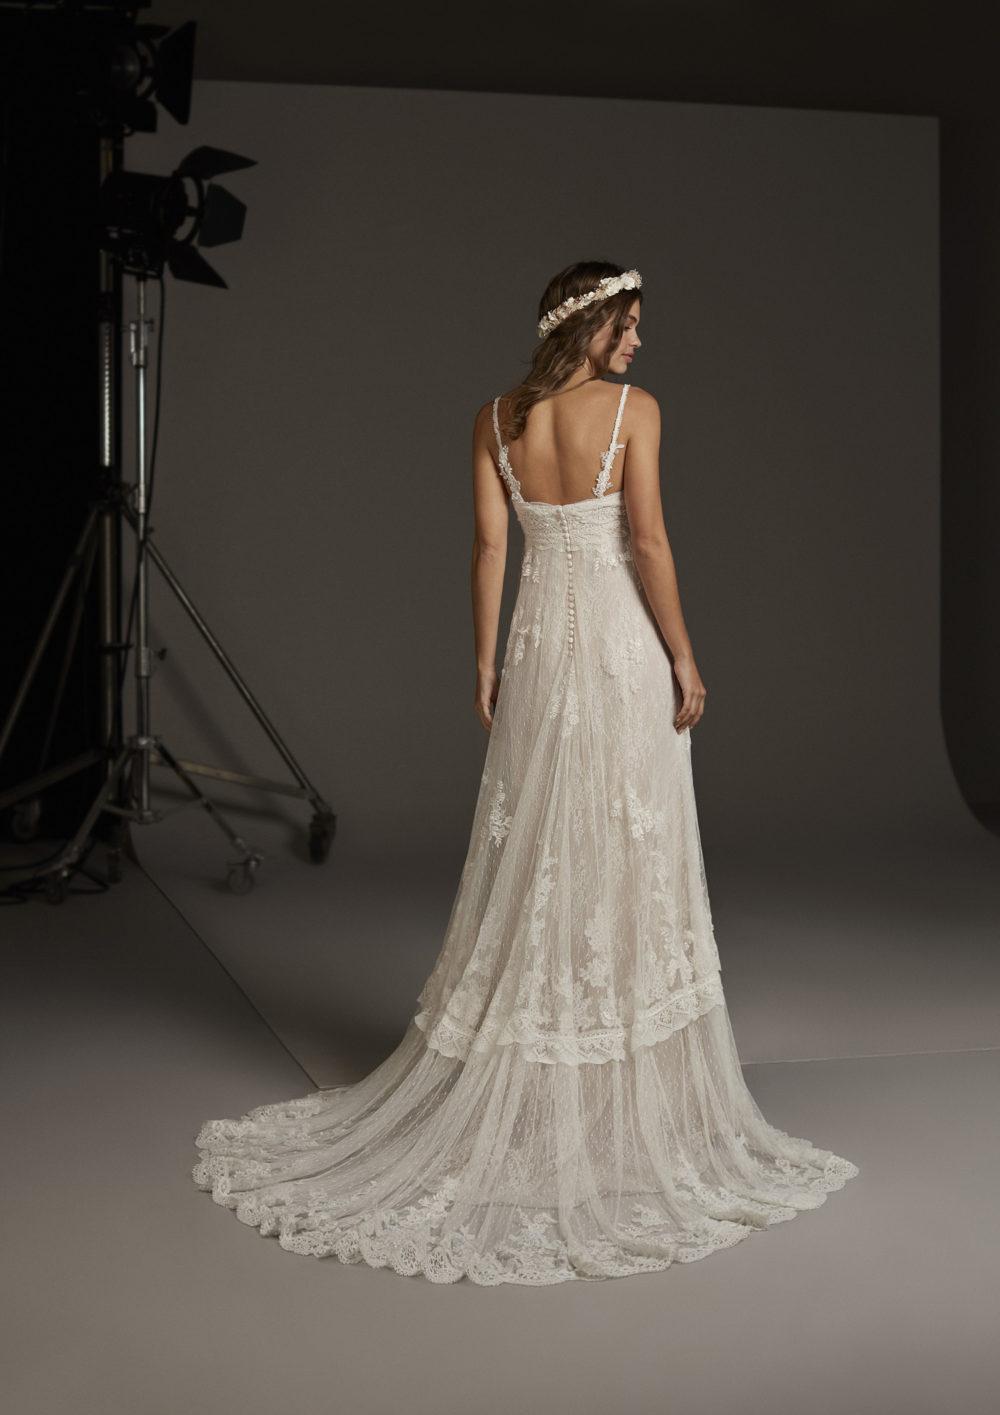 Mariages: abito da sposa Pronovias 2020 a Vicenza, Verona, Padova, Veneto CORDELIA